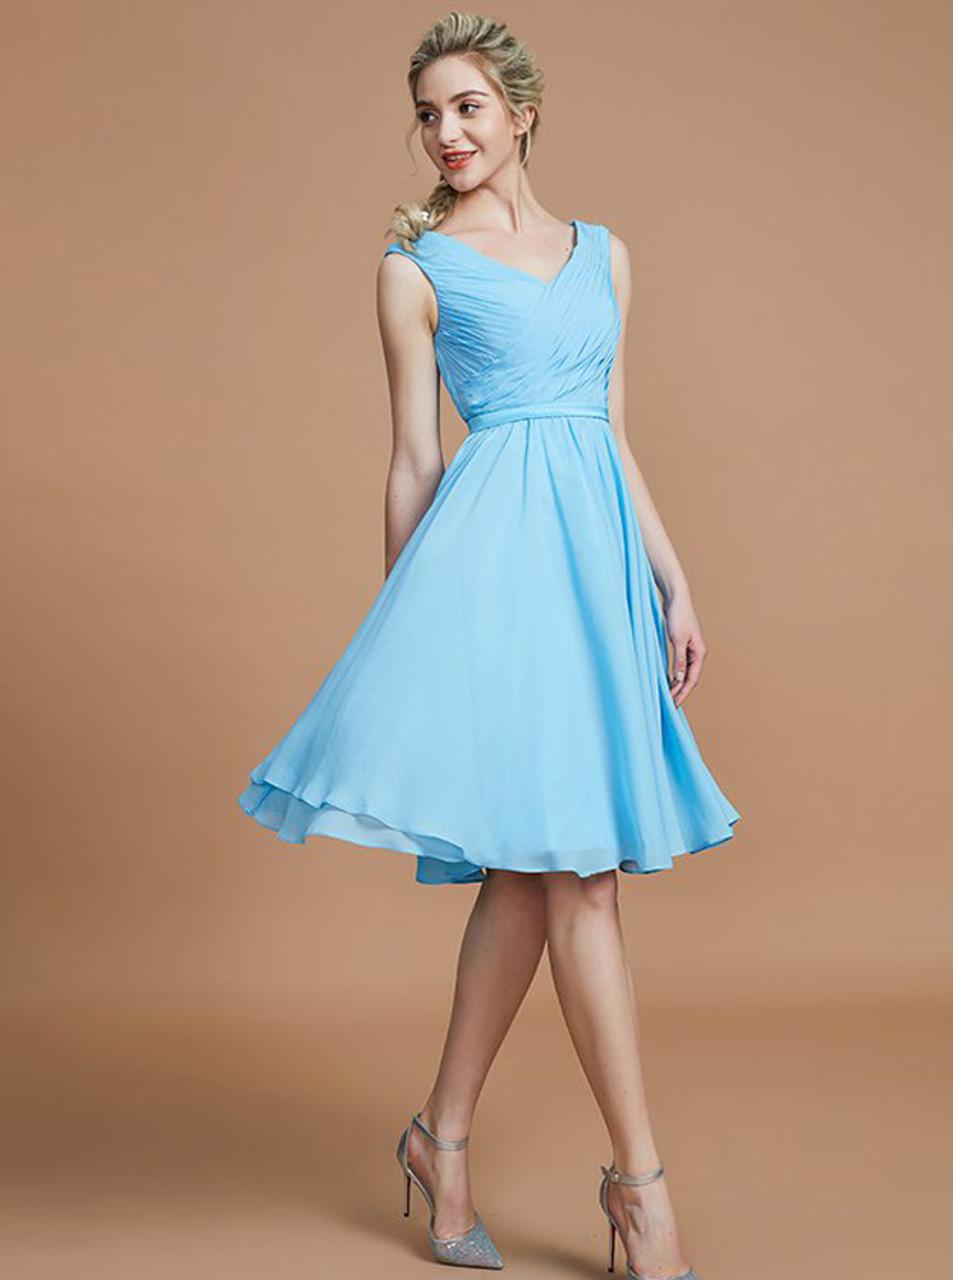 83e4a1a928f5f Light Blue Short Bridesmaid Dresses,Chiffon Knee Length Bridesmaid Dress,11340  - Landress.co.uk